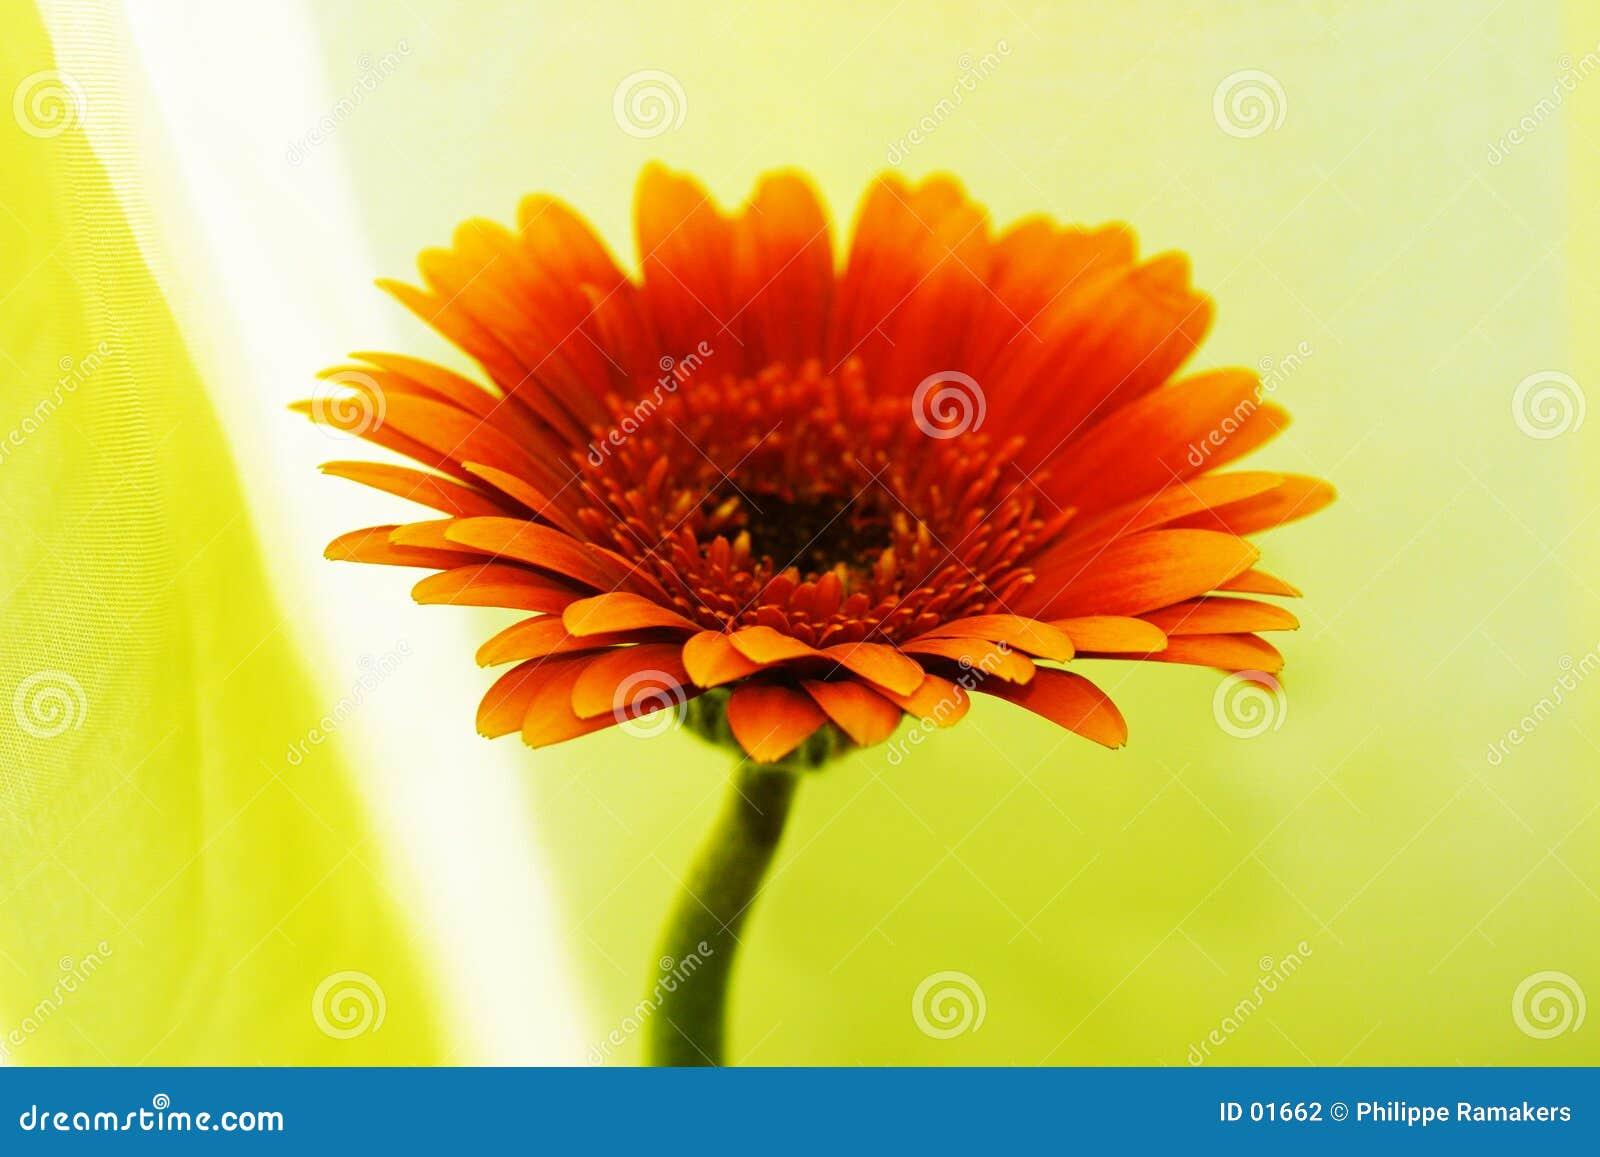 Fleur superbe